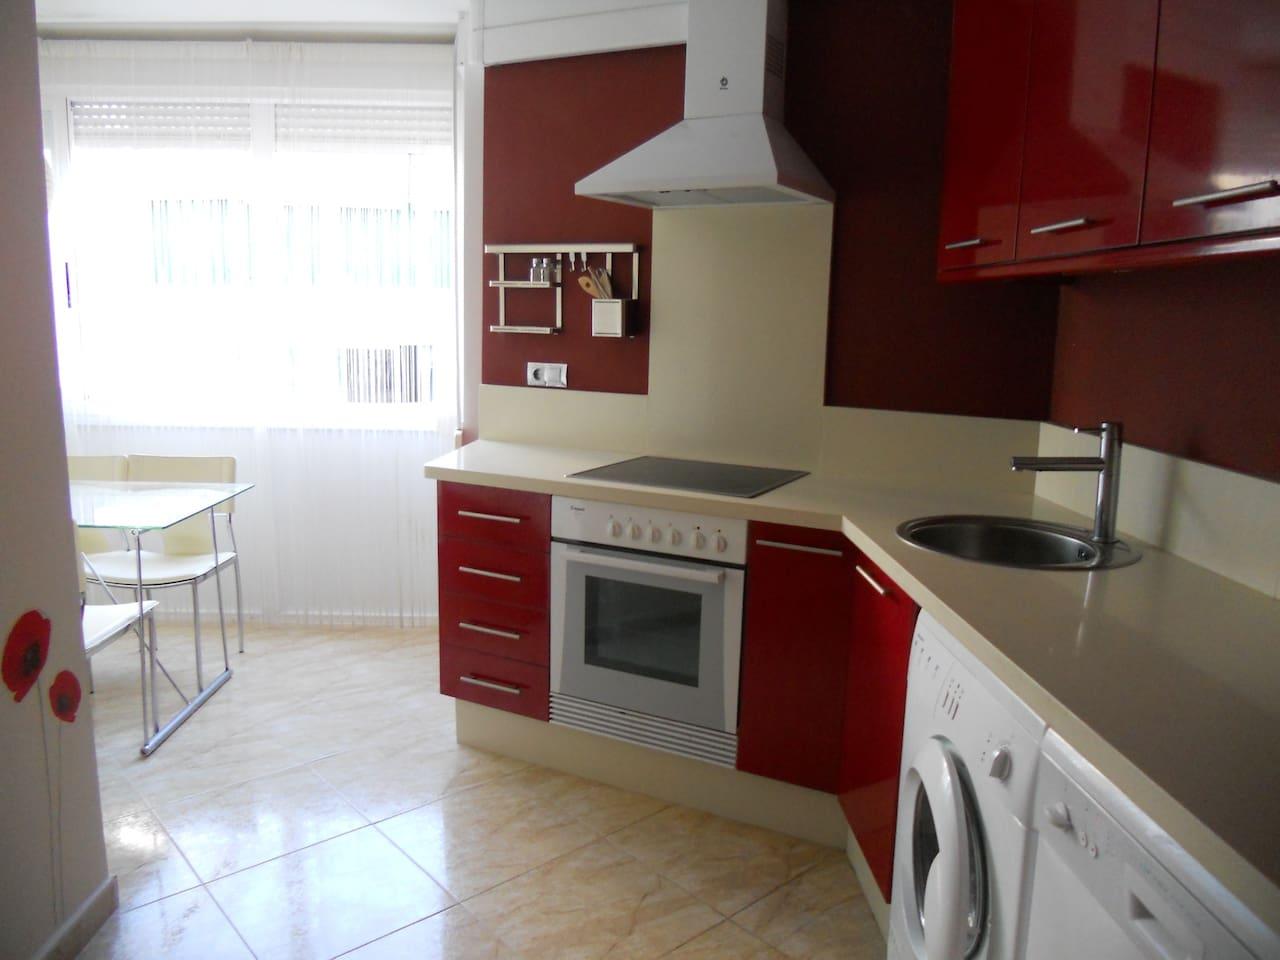 Moderna Cocina / Modern Kitchen/ Cuisine  très moderne